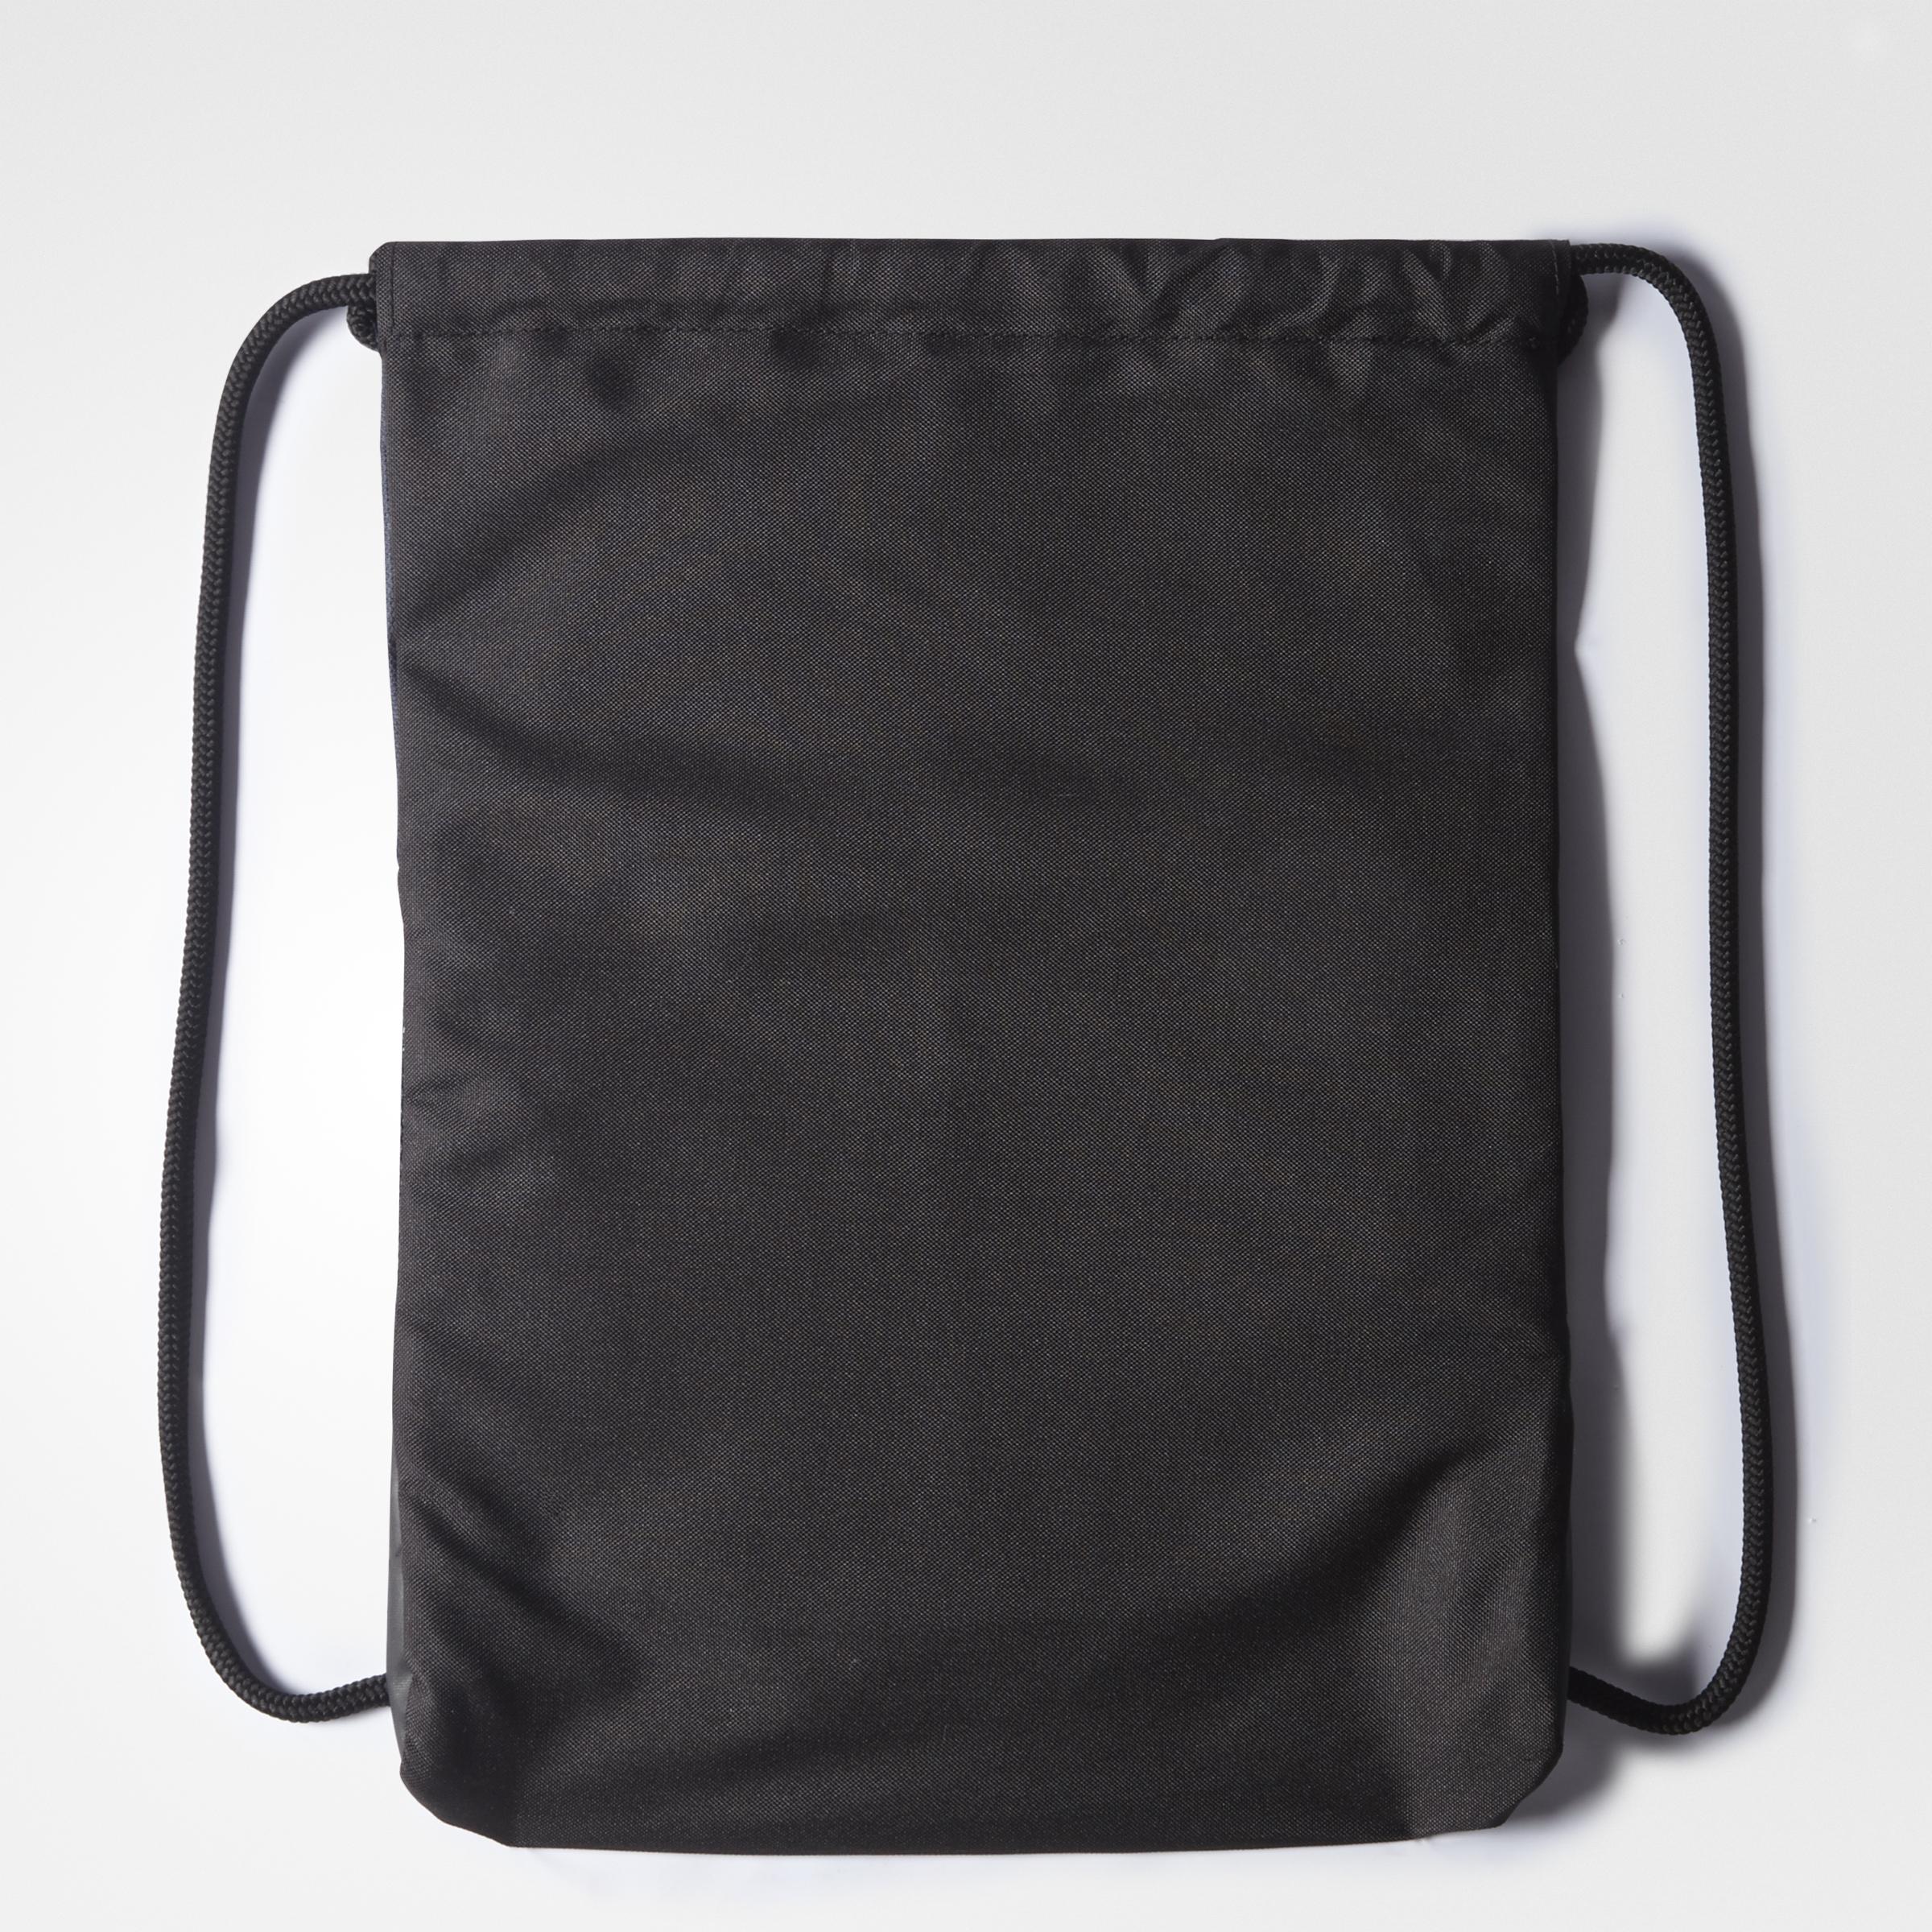 adidas-Lightning-Sackpack-Bags thumbnail 12